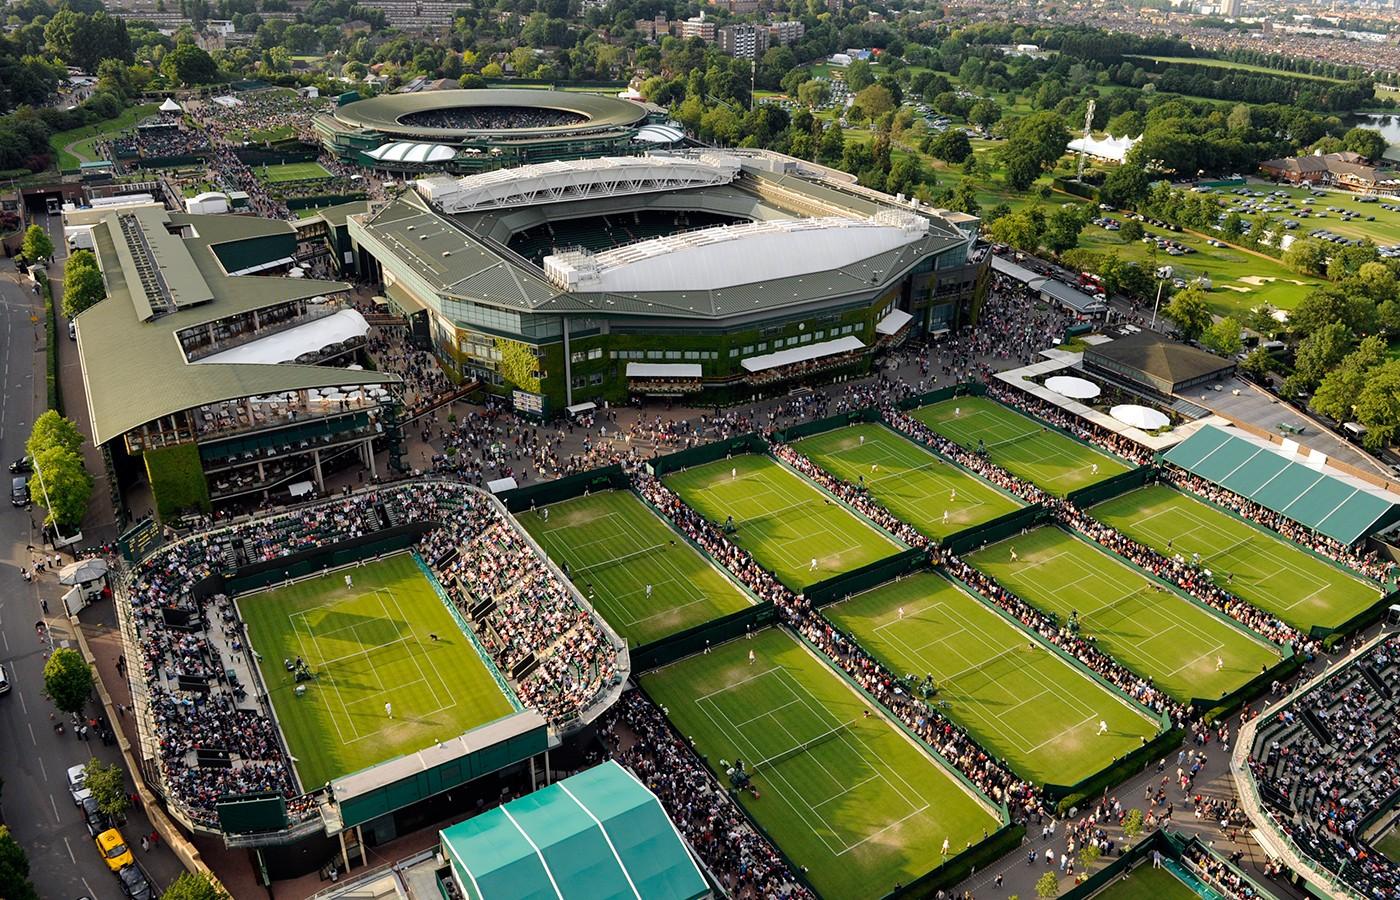 Wimbledon -  29th June - July 12th • 2020Wimbledon, Uk£835 per person